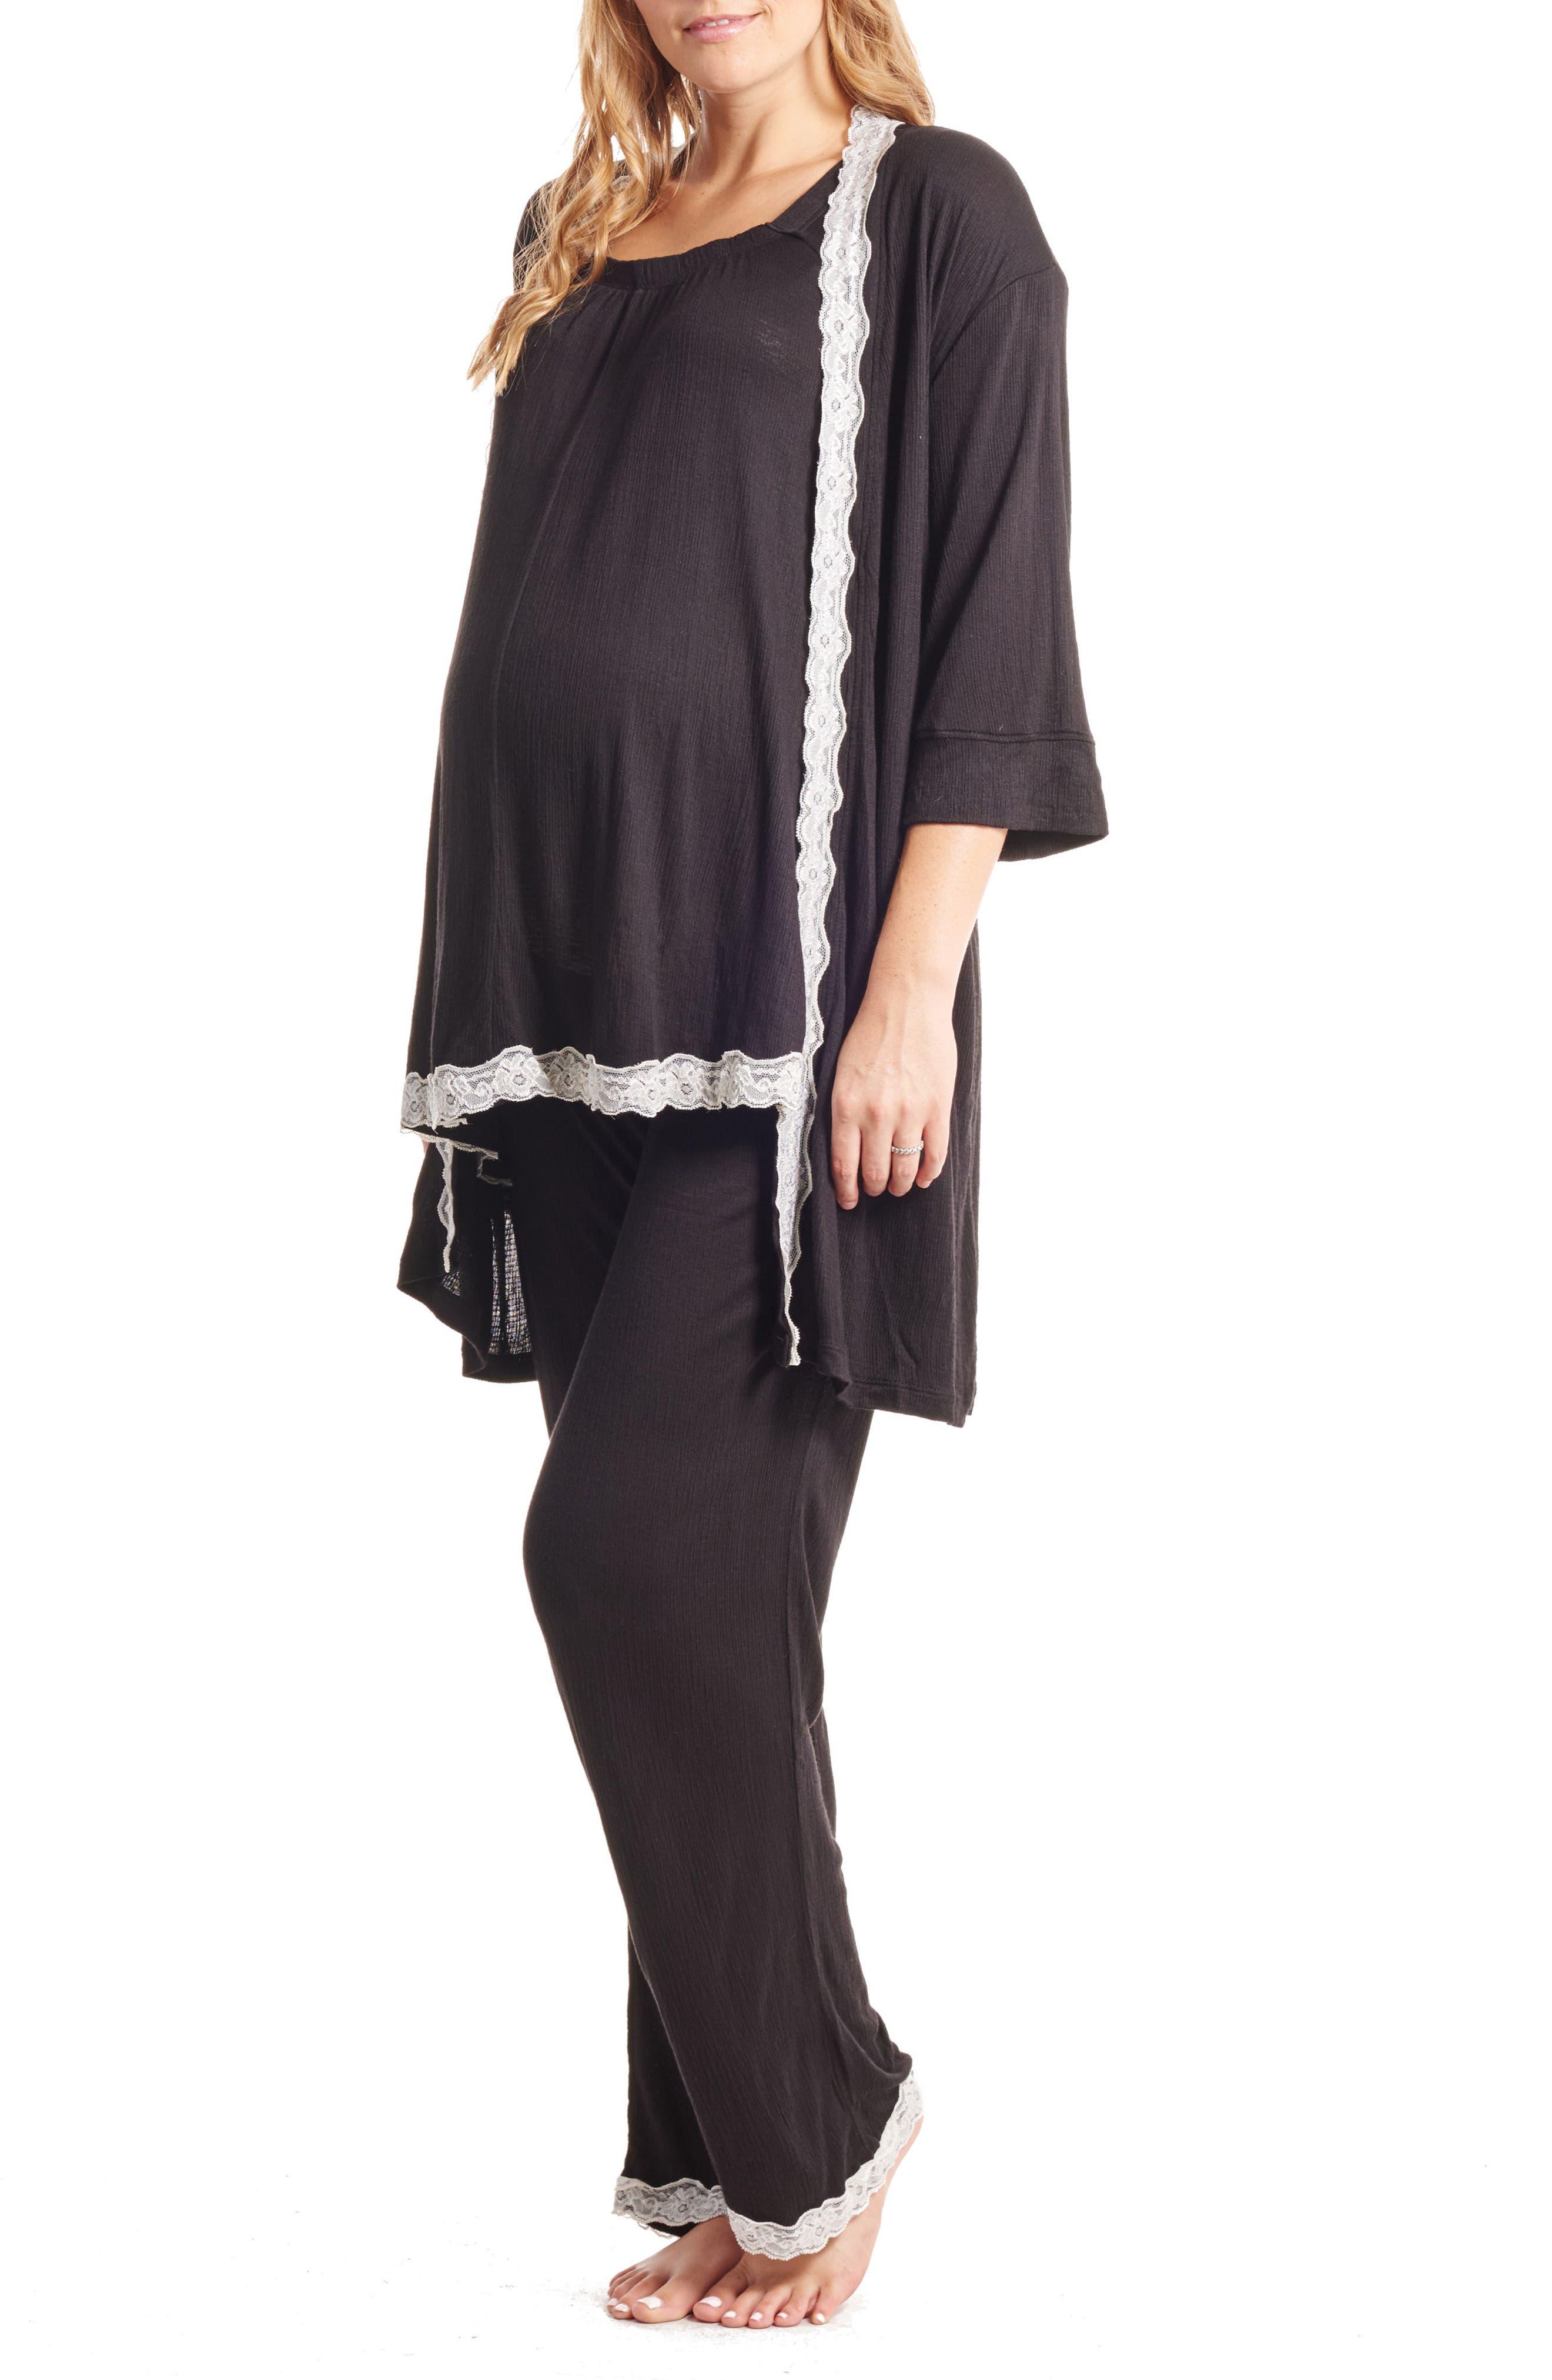 Alternate Image 1 Selected - Everly Grey Carina Maternity/Nursing Pajamas & Robe Set